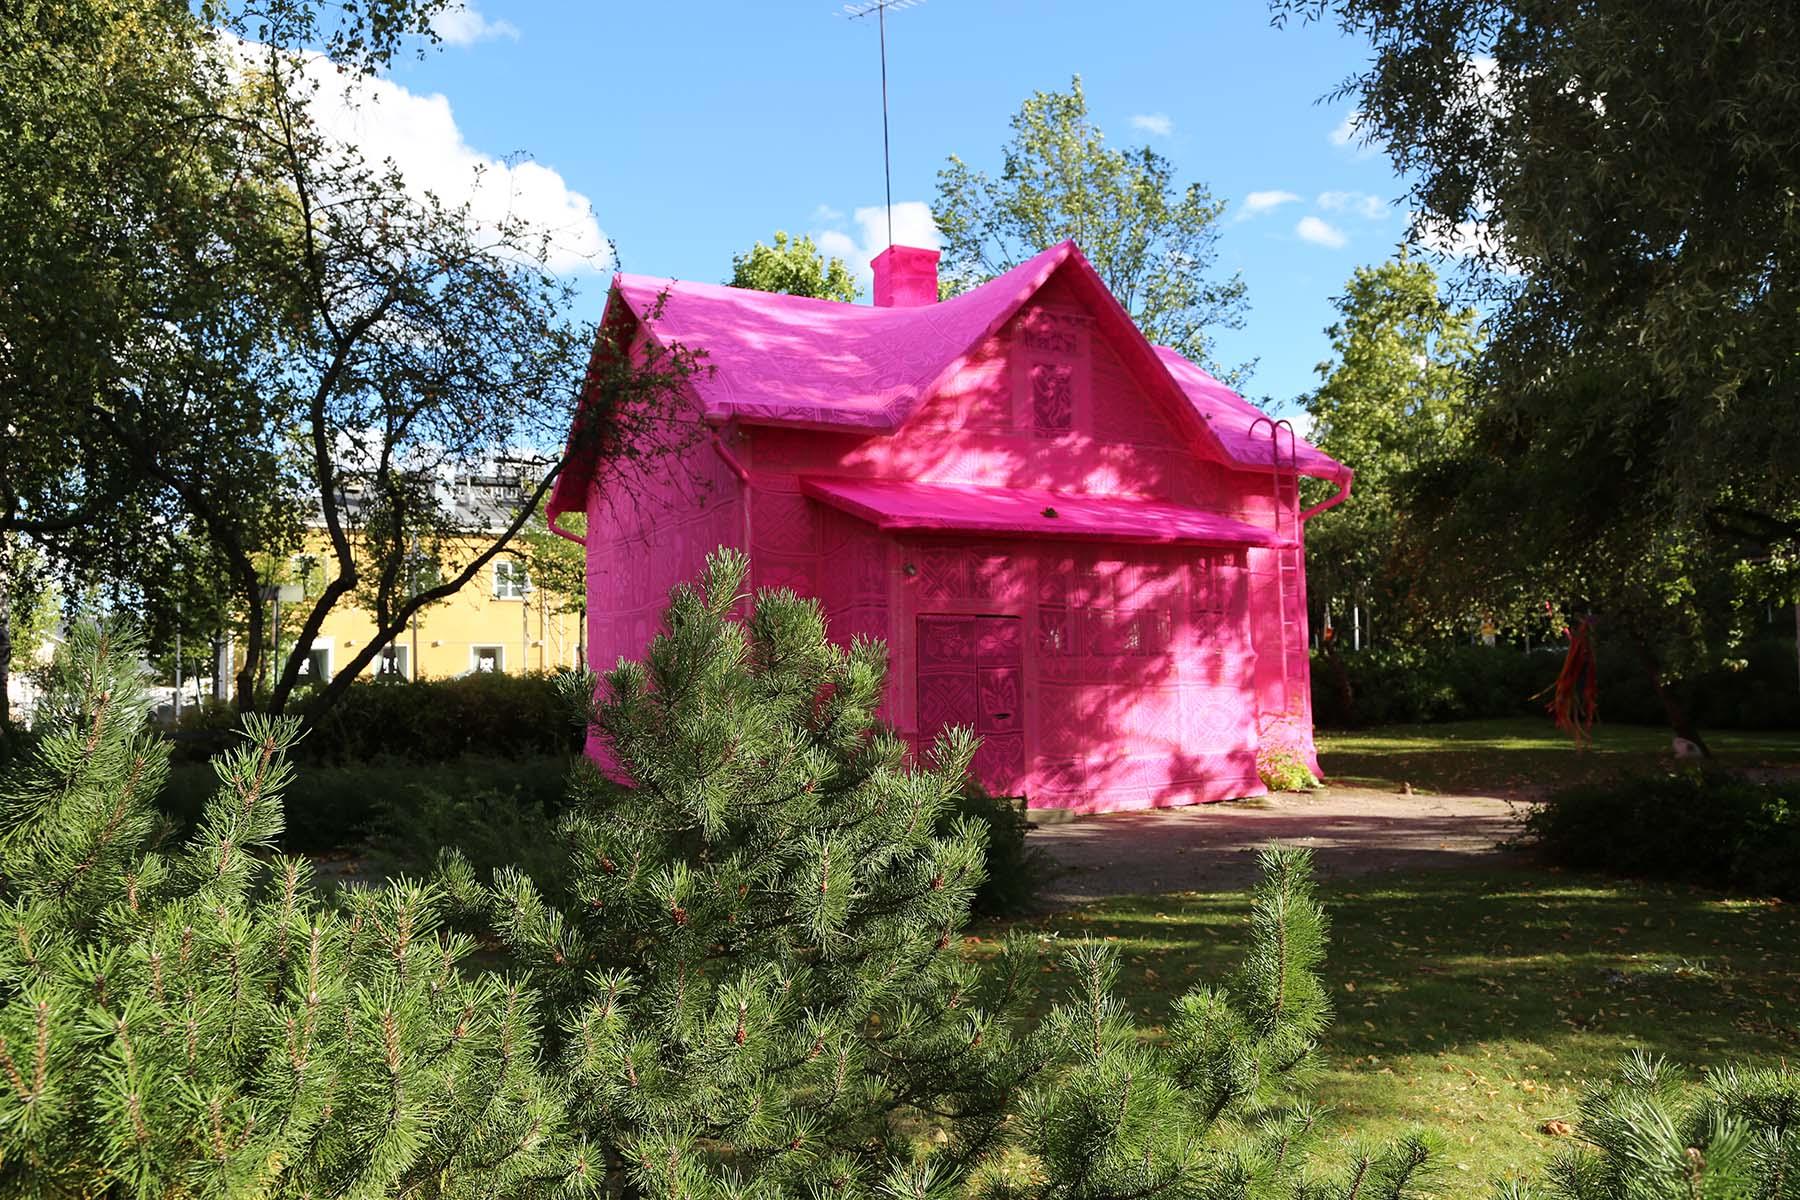 astor place cube, sculptures, sculptor, installations, performance